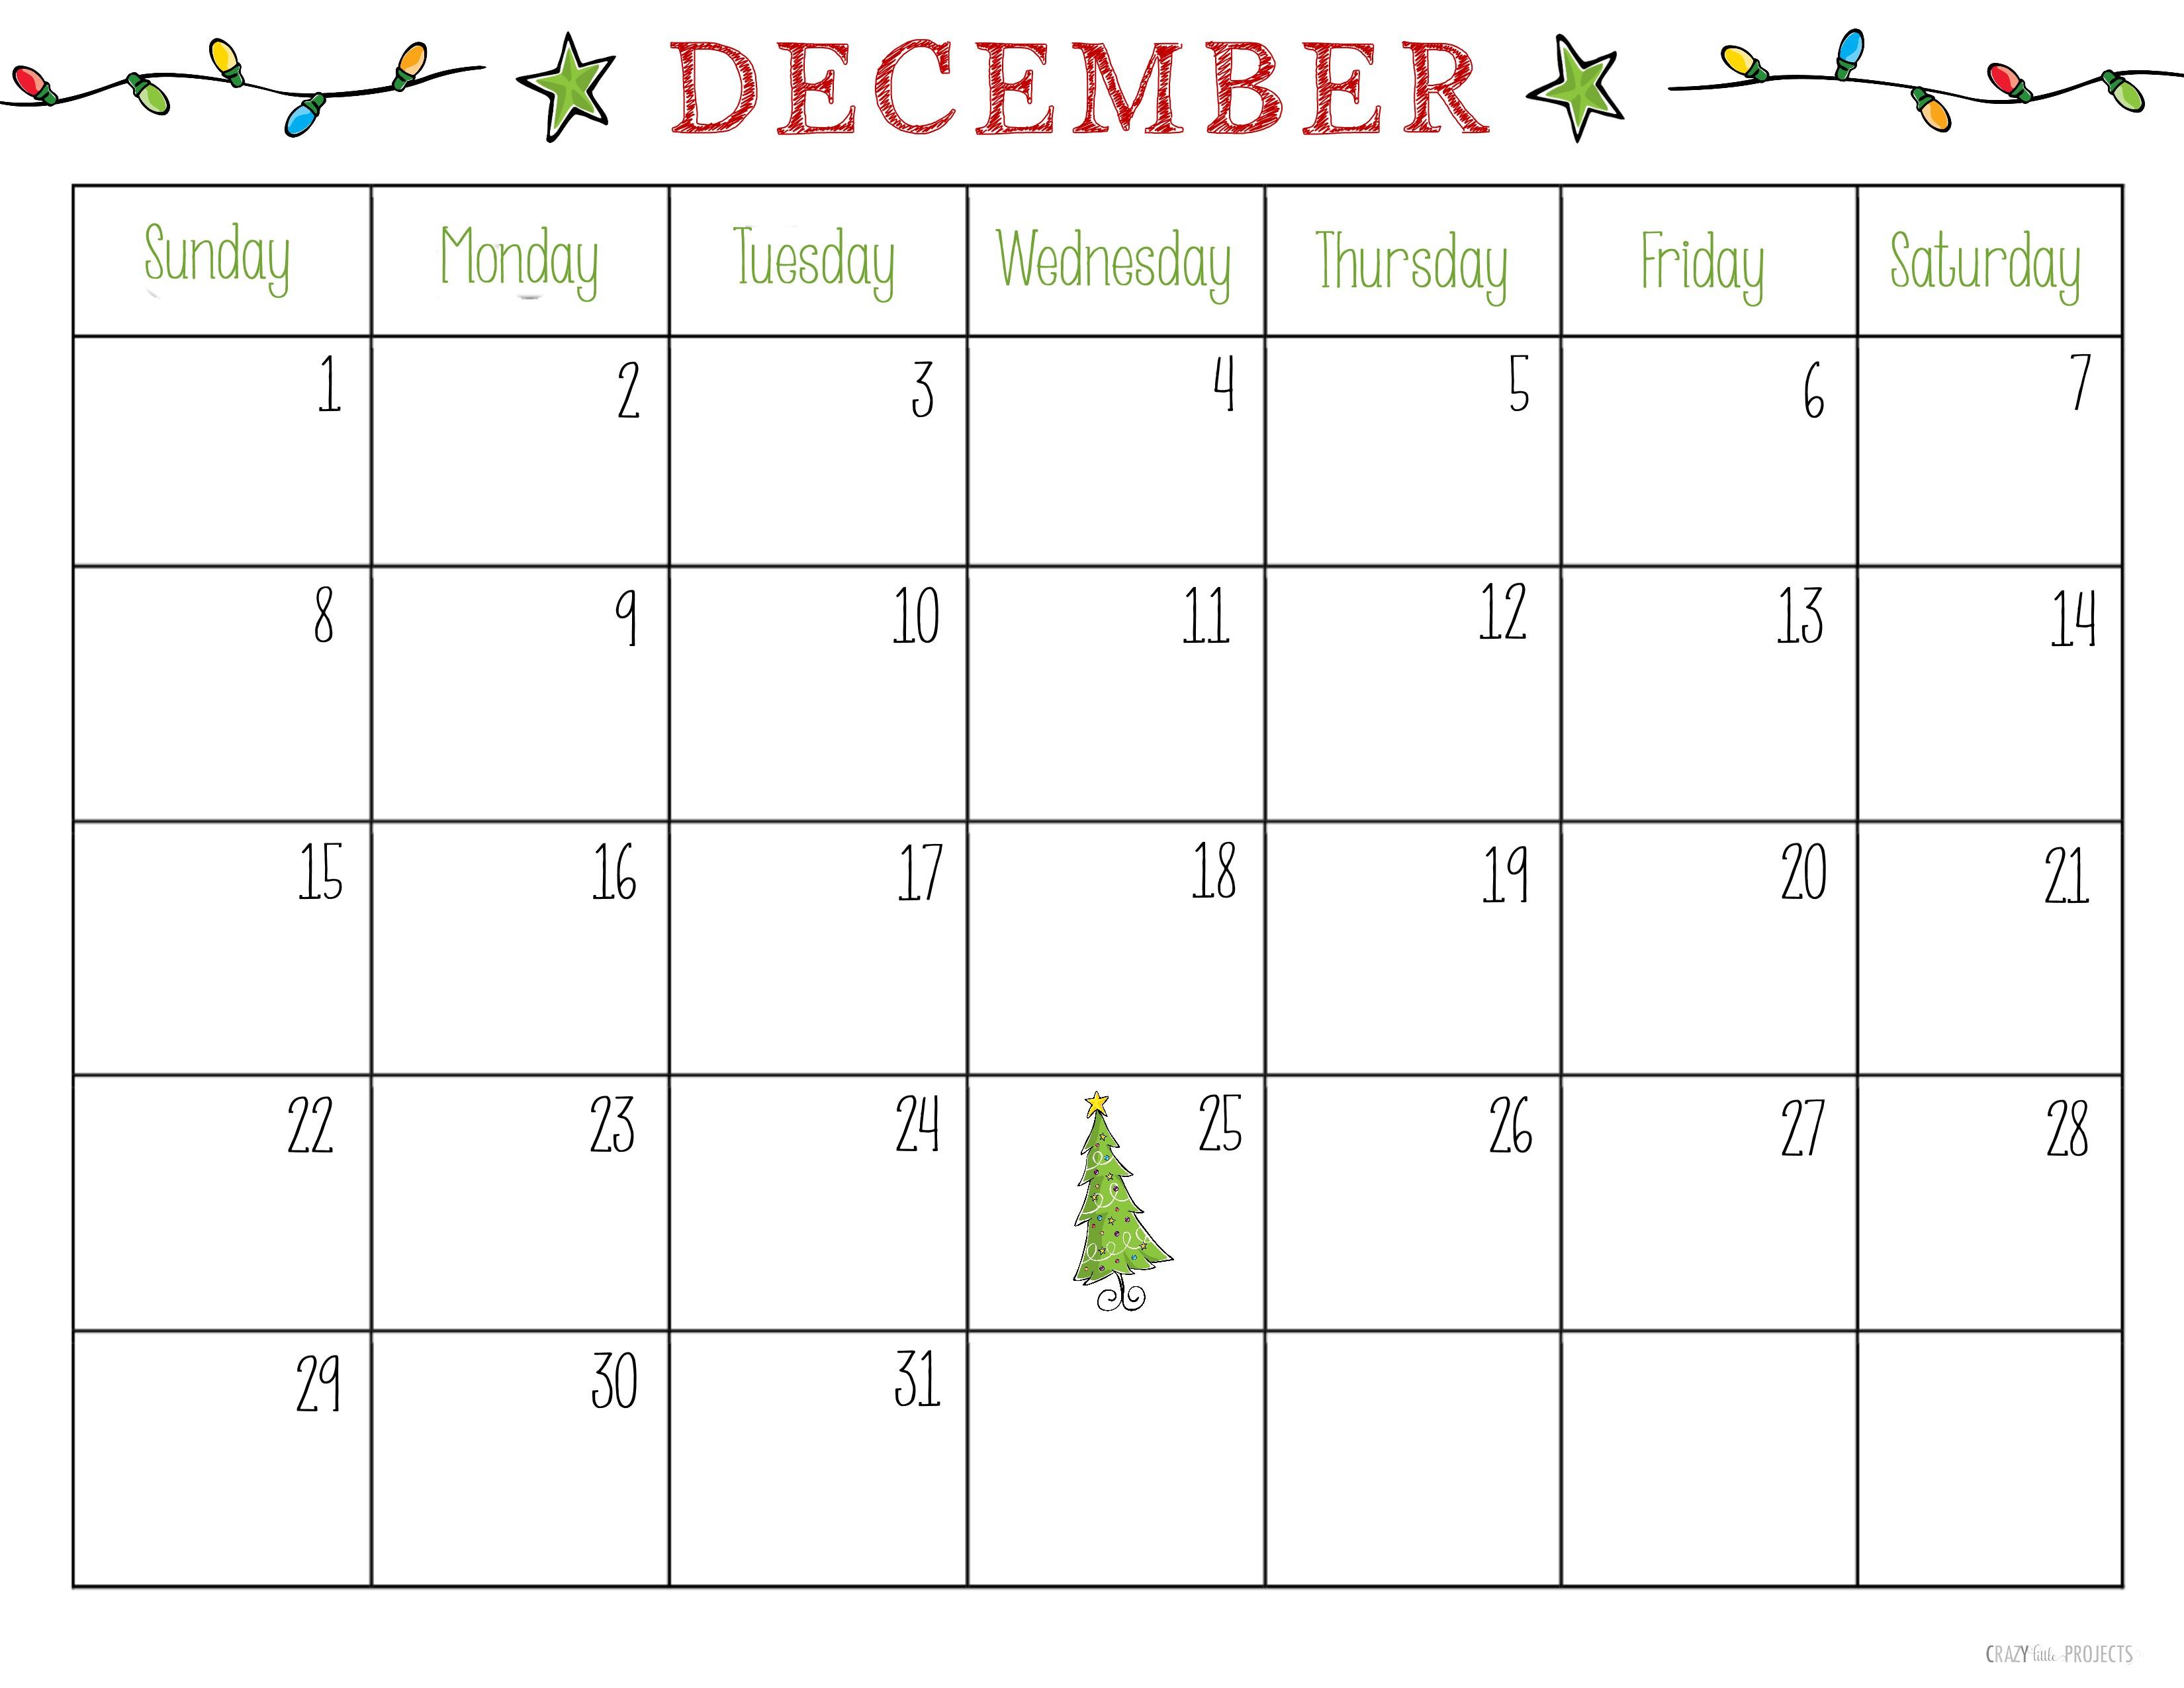 December Calendar 2018 Printable Editable Template within Christmas Calendar Printable Template